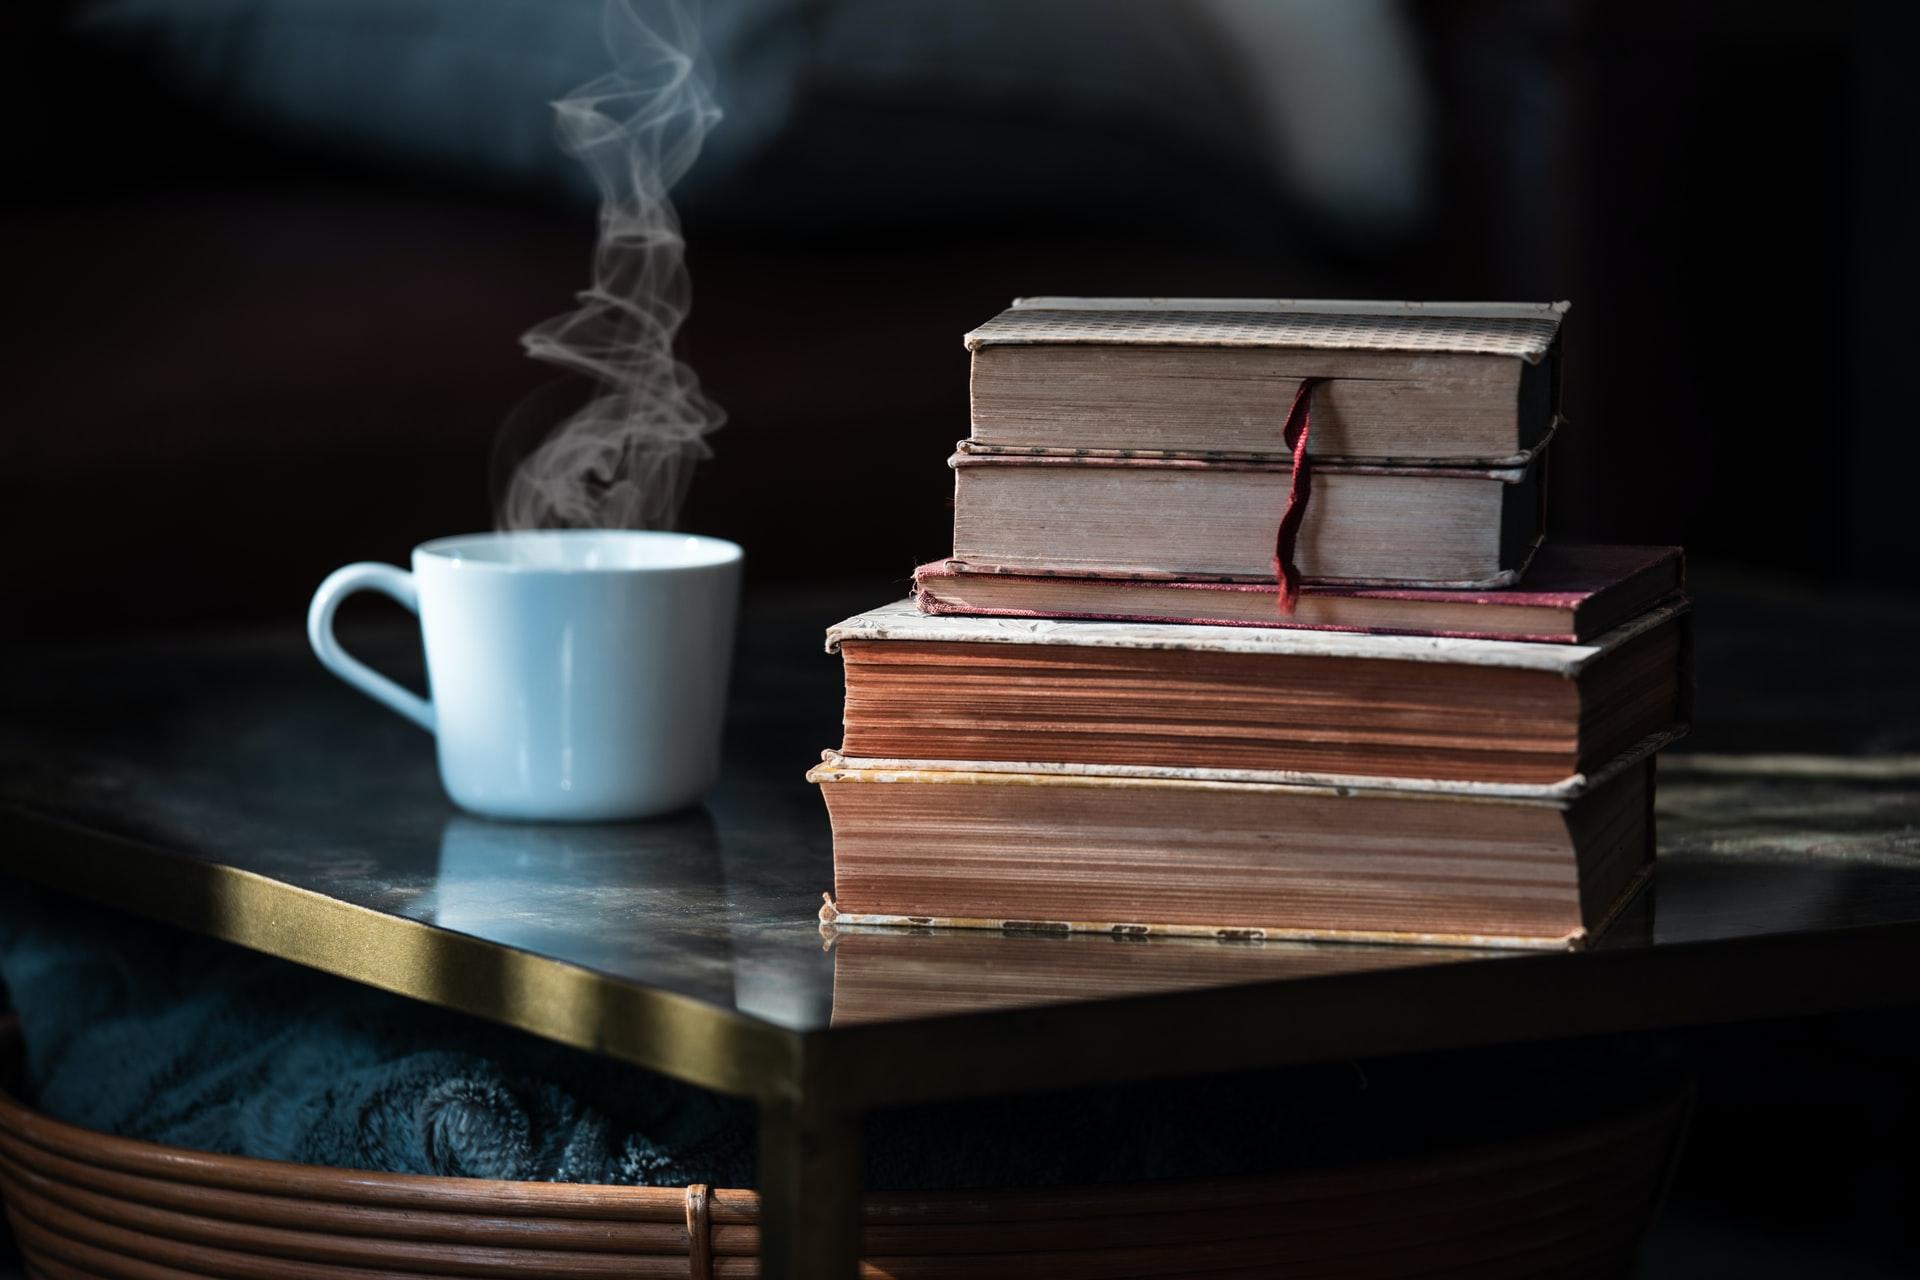 8 Compelling Books Like Ender's Game